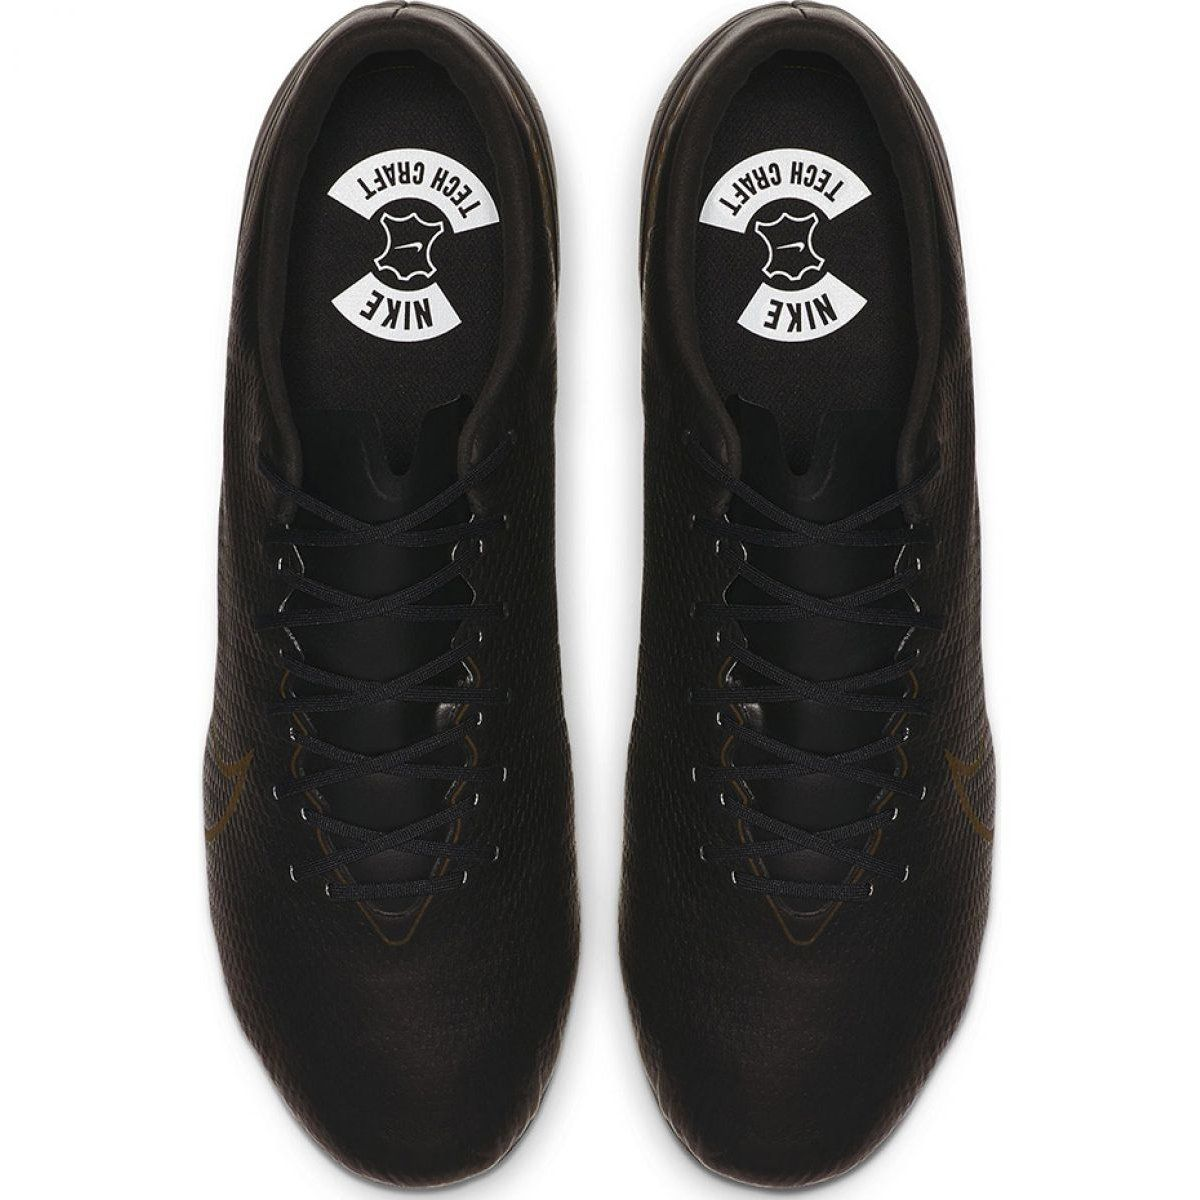 Buty Pilkarskie Nike Mercurial Vapor 13 Elite Tc Fg M Cj6320 001 Czarne Czarne Football Shoes Nike Cleats Black Shoes